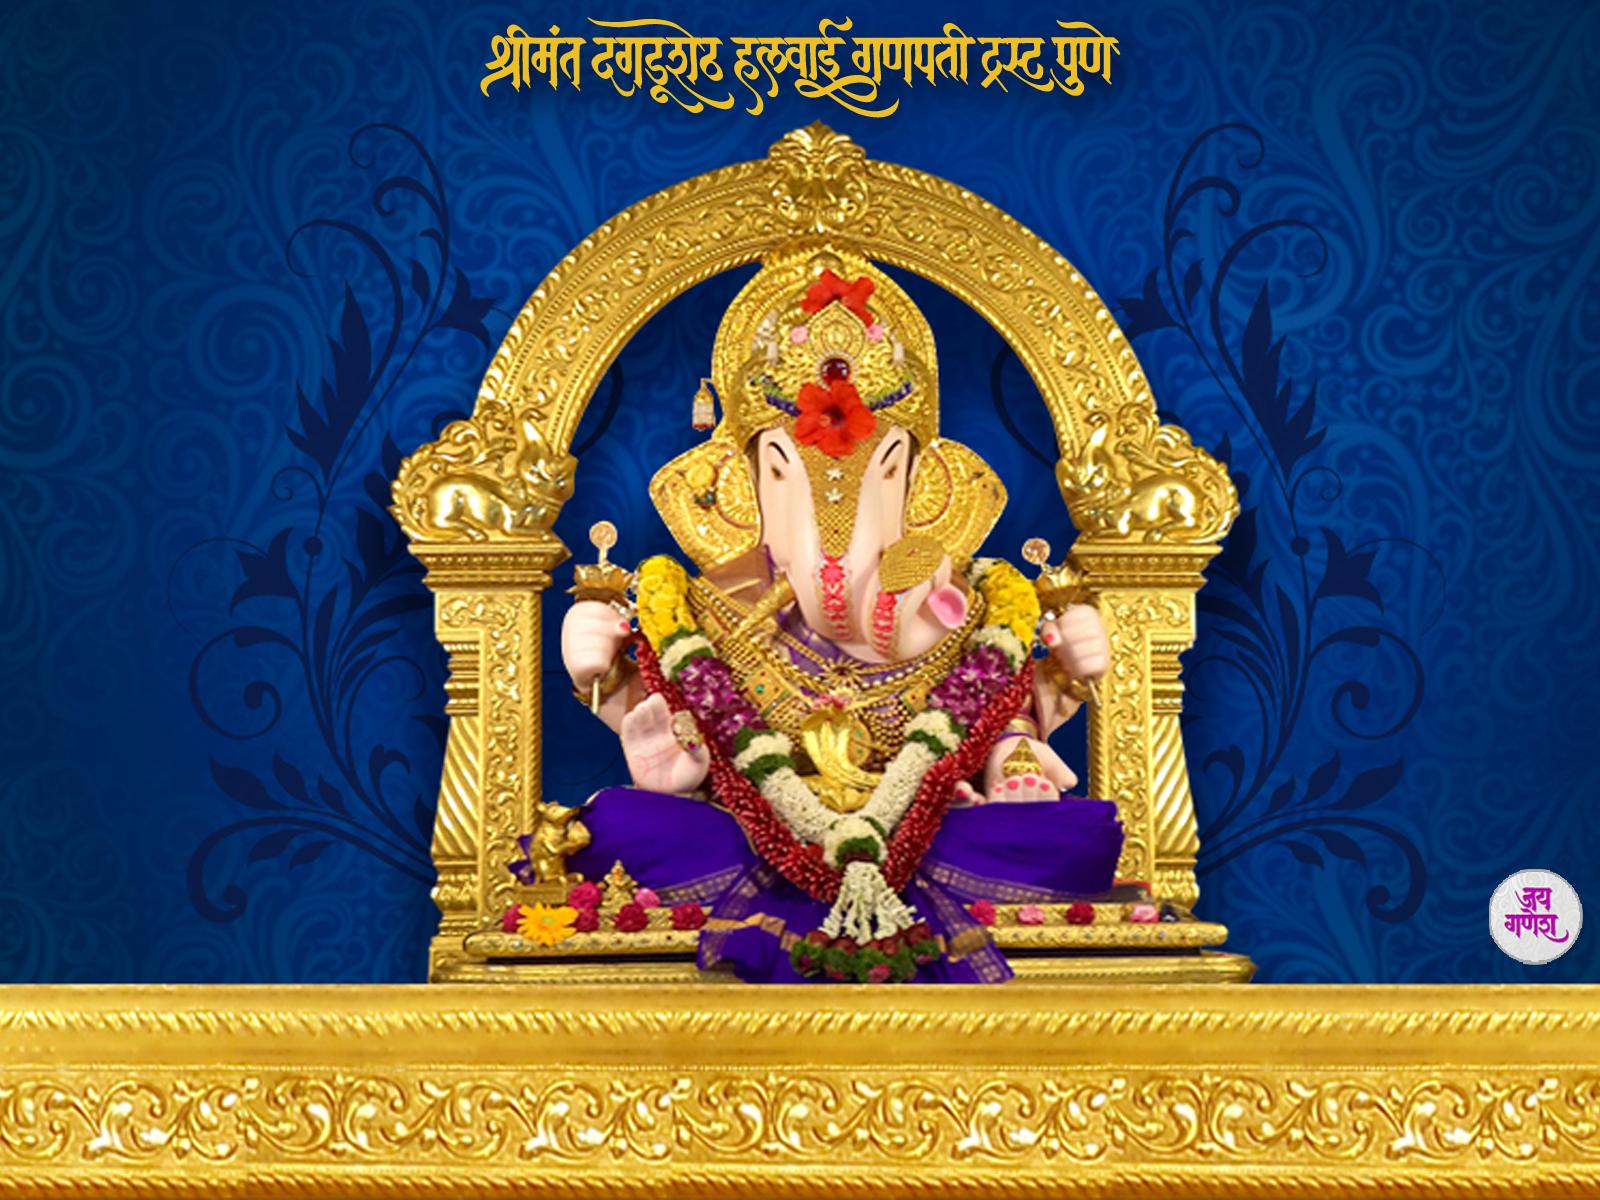 Dagdusheth-Ganpati-Images-wallpaper-wp4001834